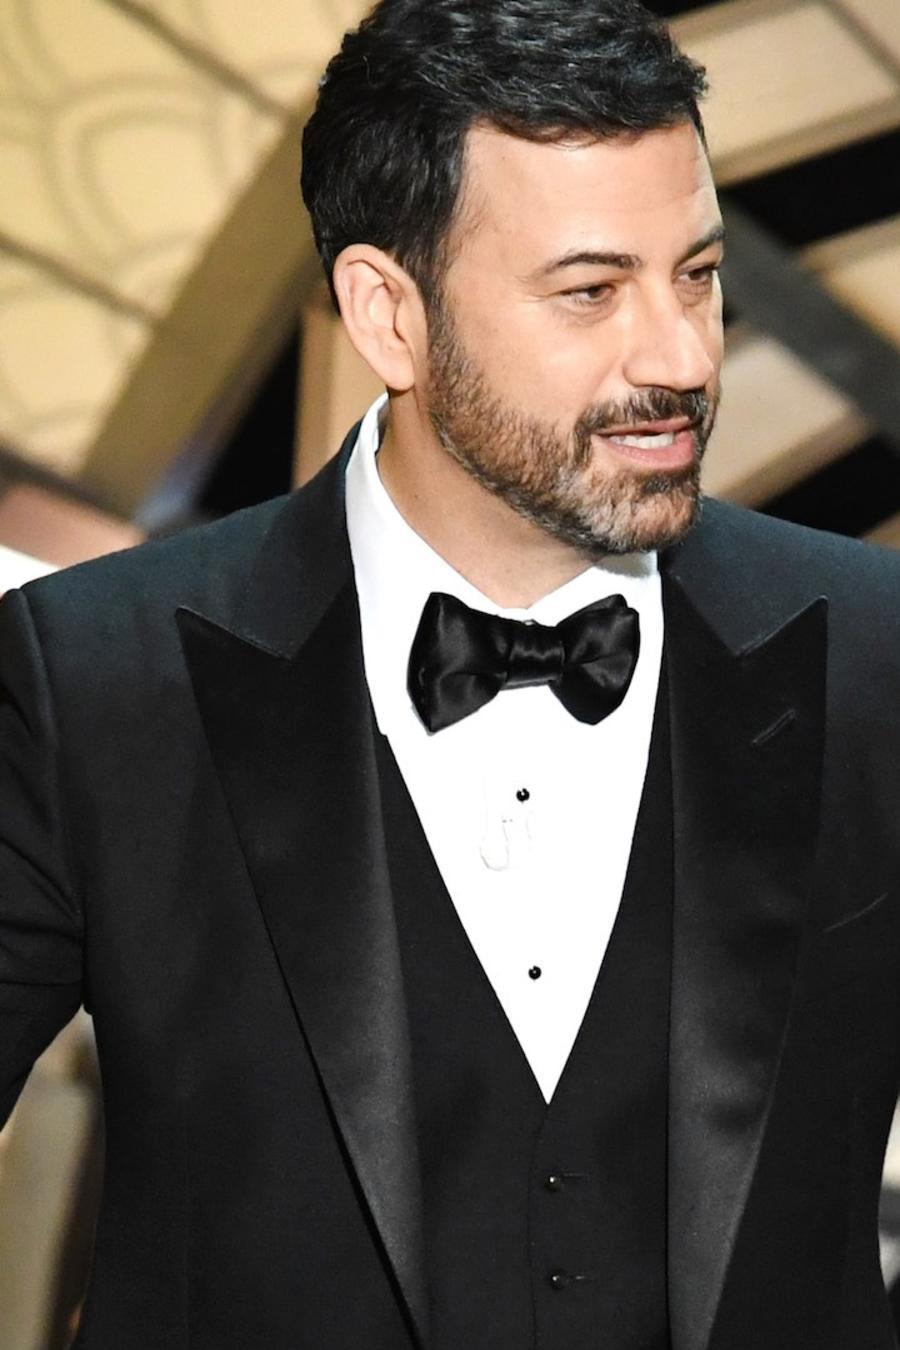 Jimmy Kimmel dando un discurso